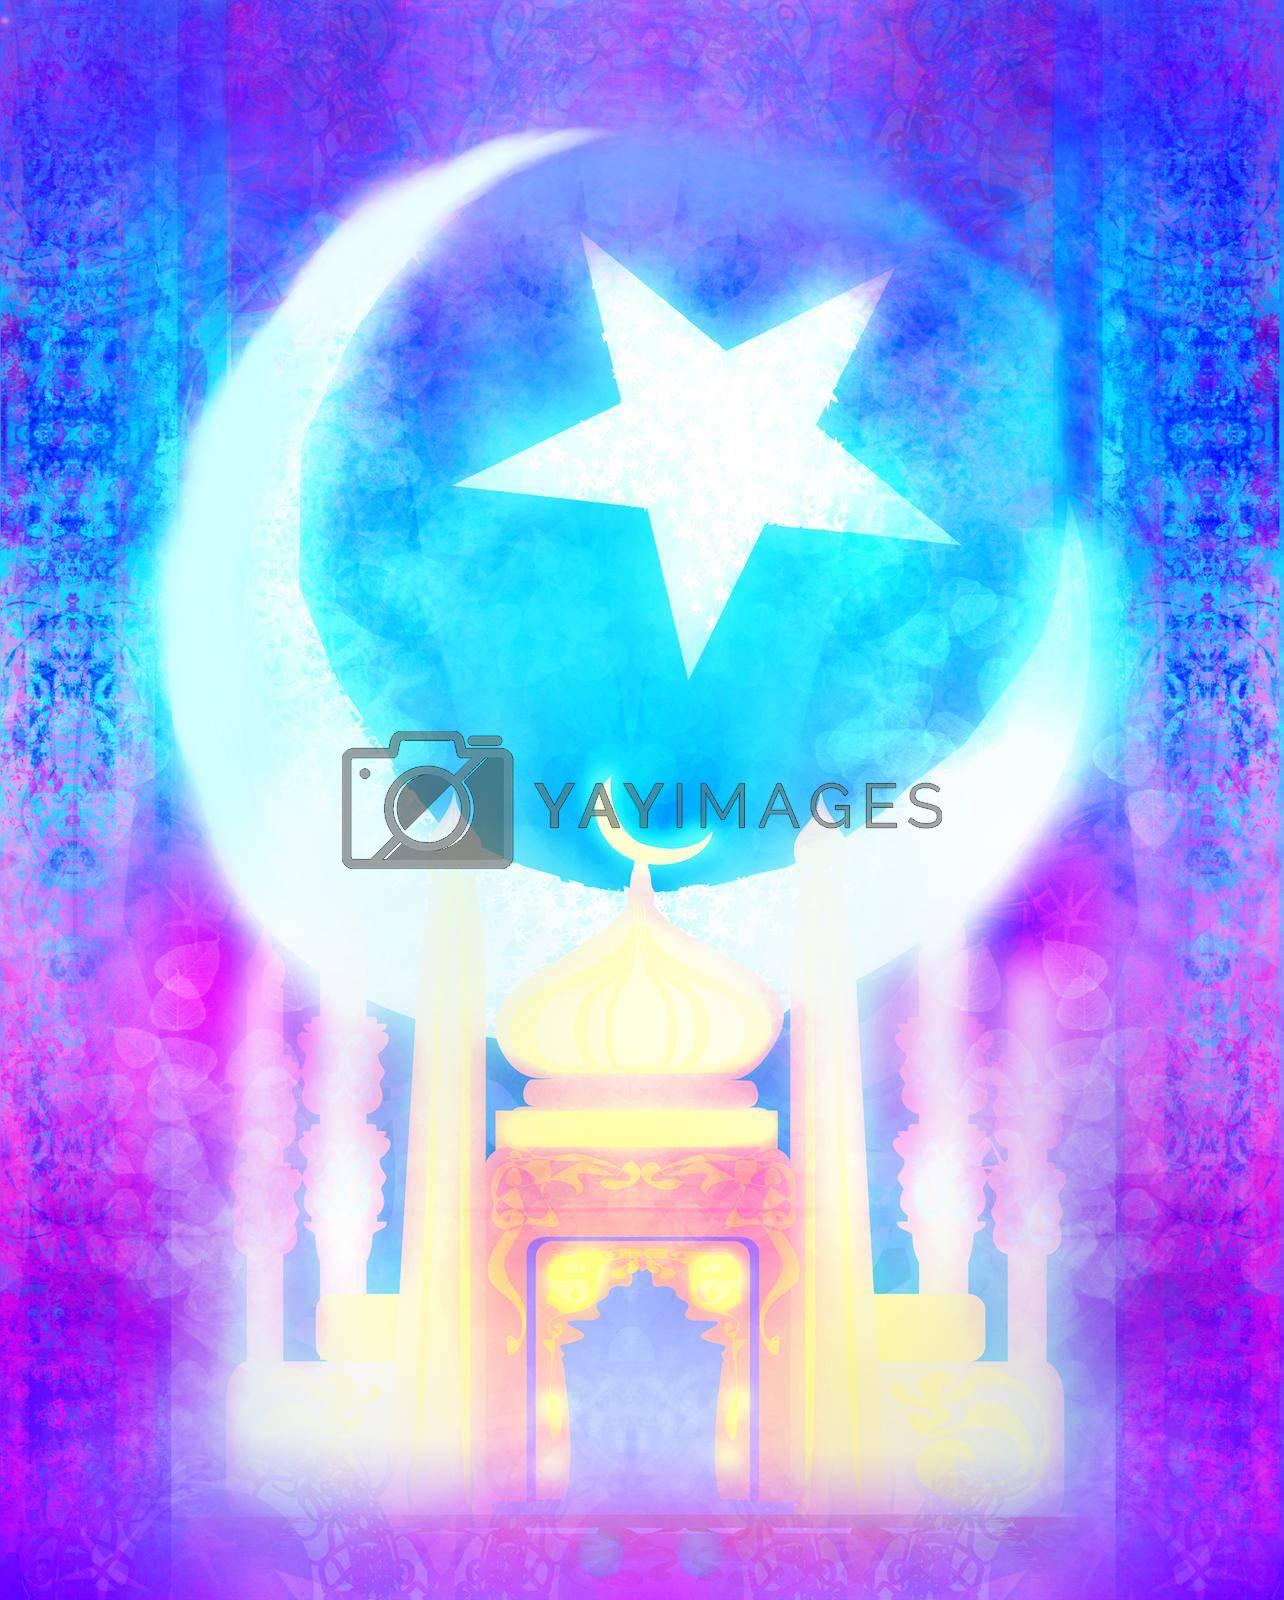 Royalty free image of Ramadan Kareem holiday greeting card design. by JackyBrown